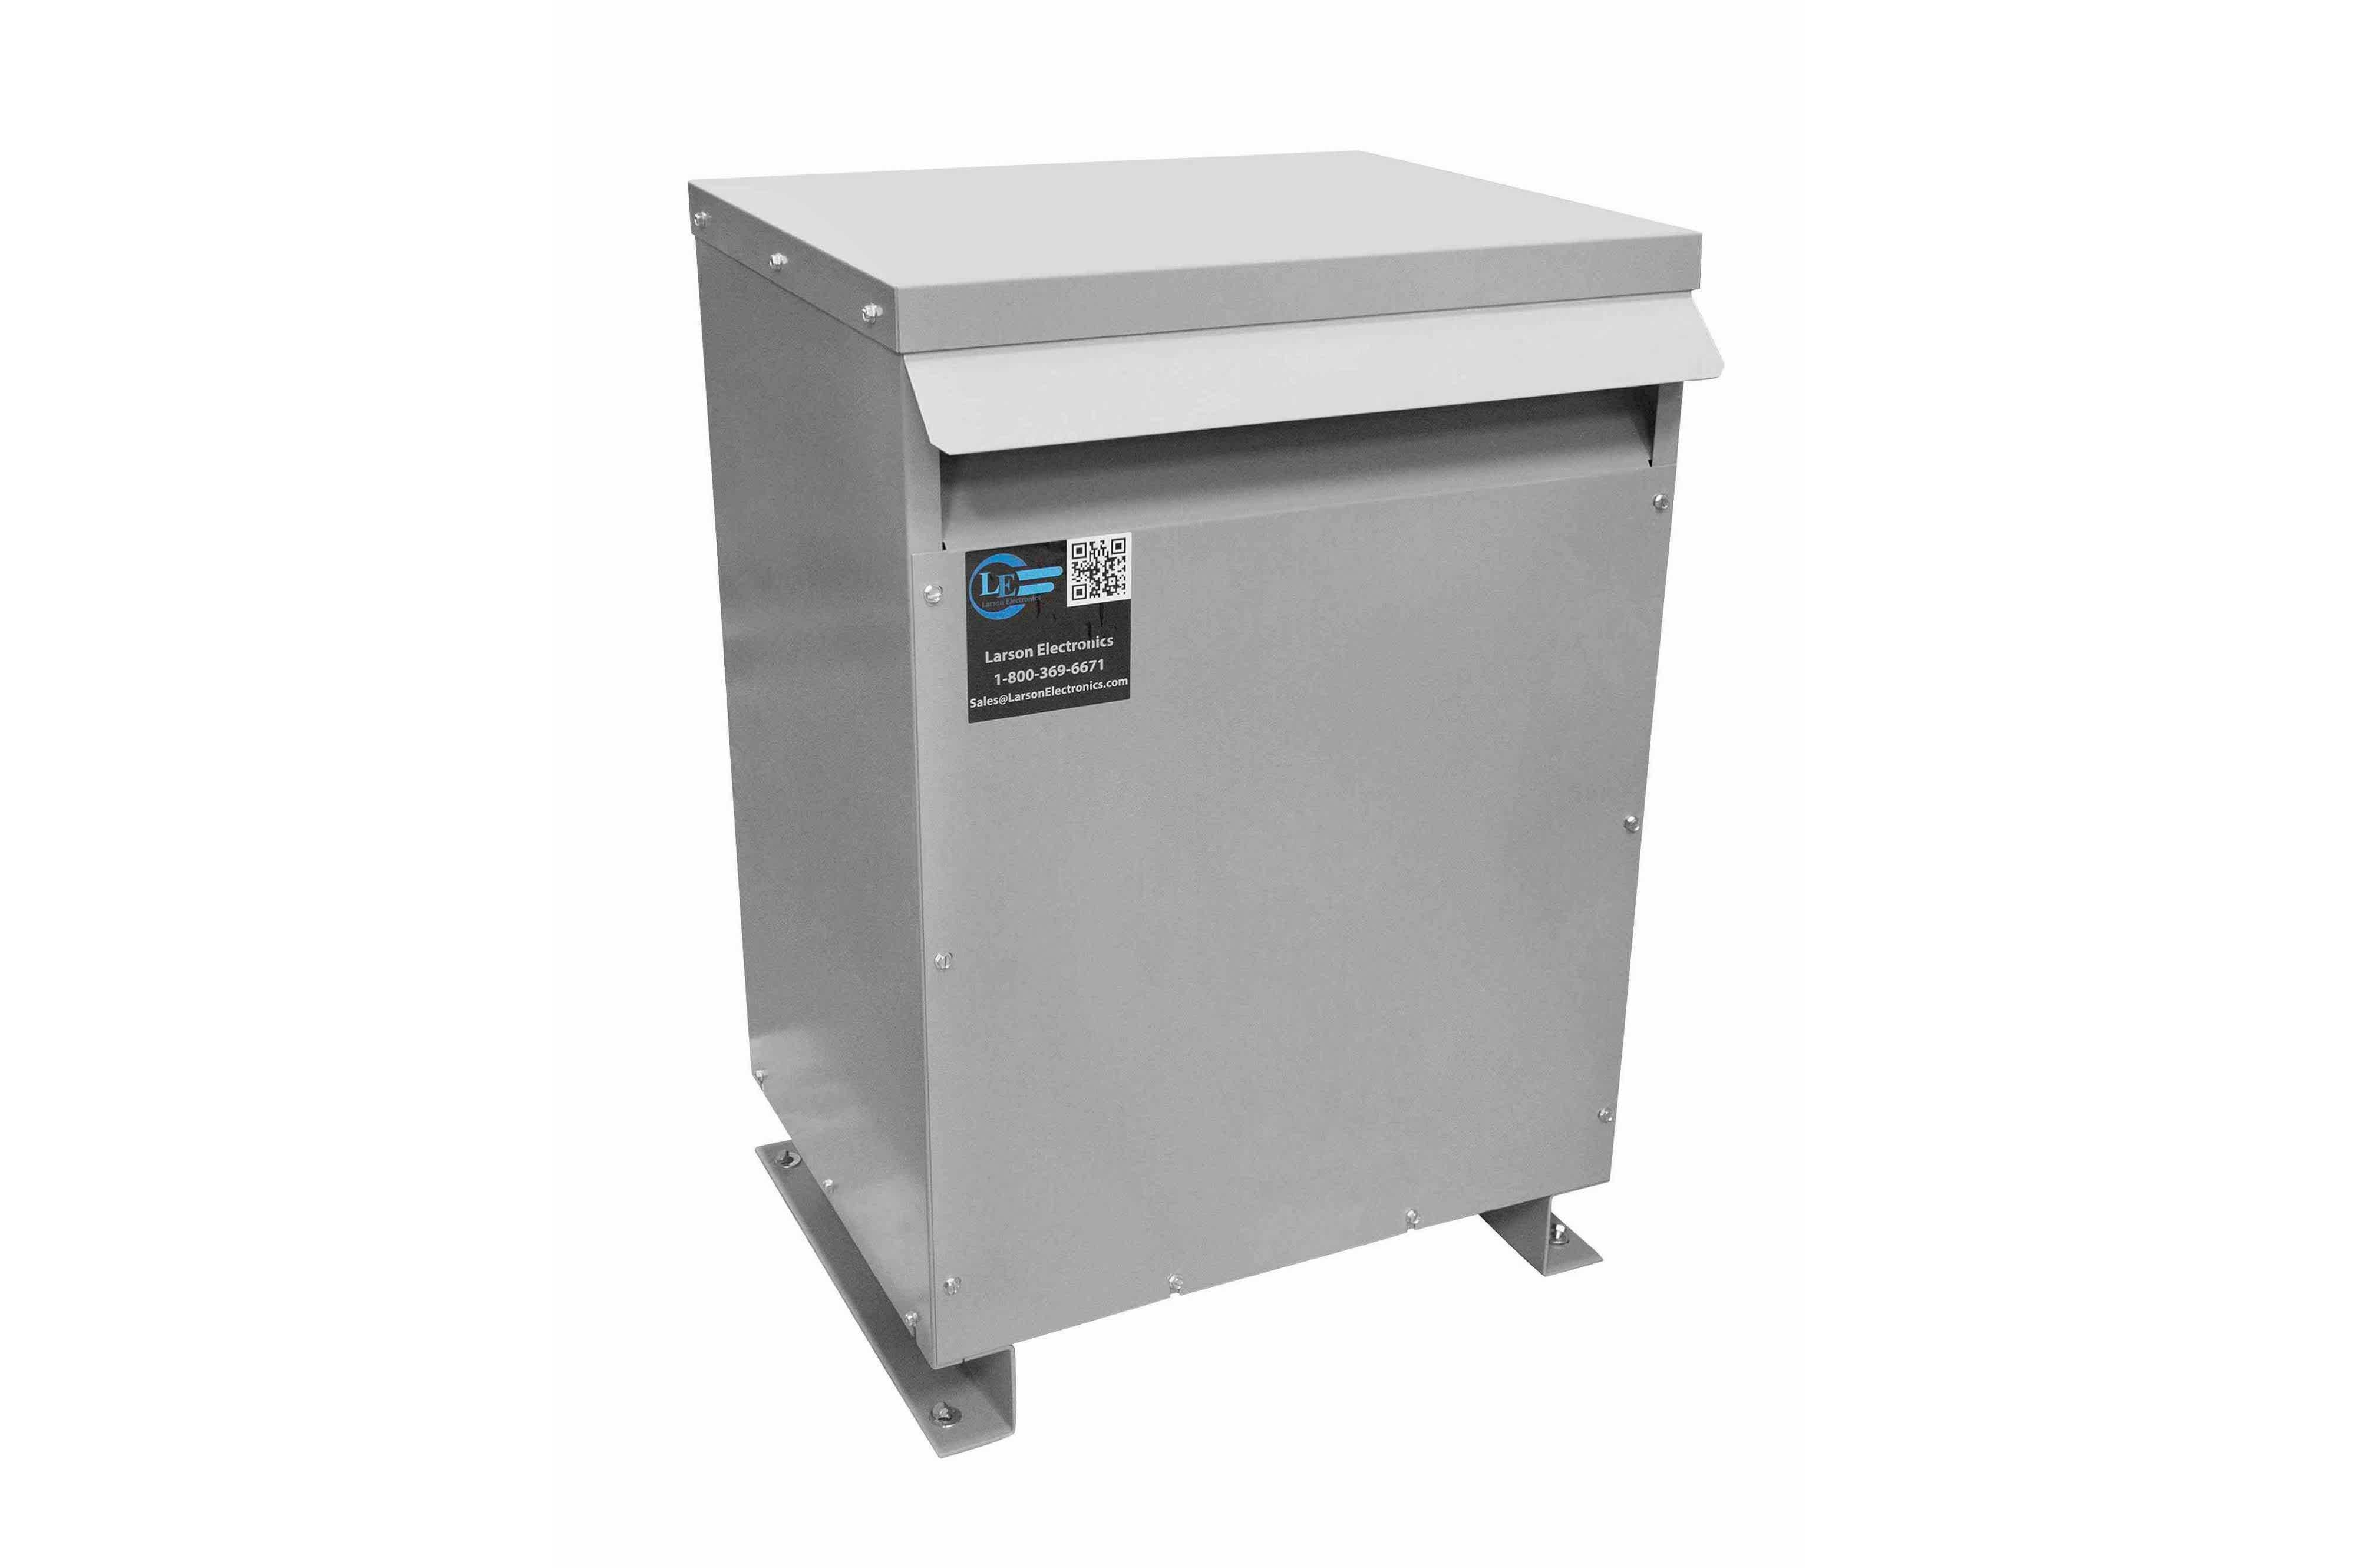 150 kVA 3PH Isolation Transformer, 460V Wye Primary, 240V/120 Delta Secondary, N3R, Ventilated, 60 Hz